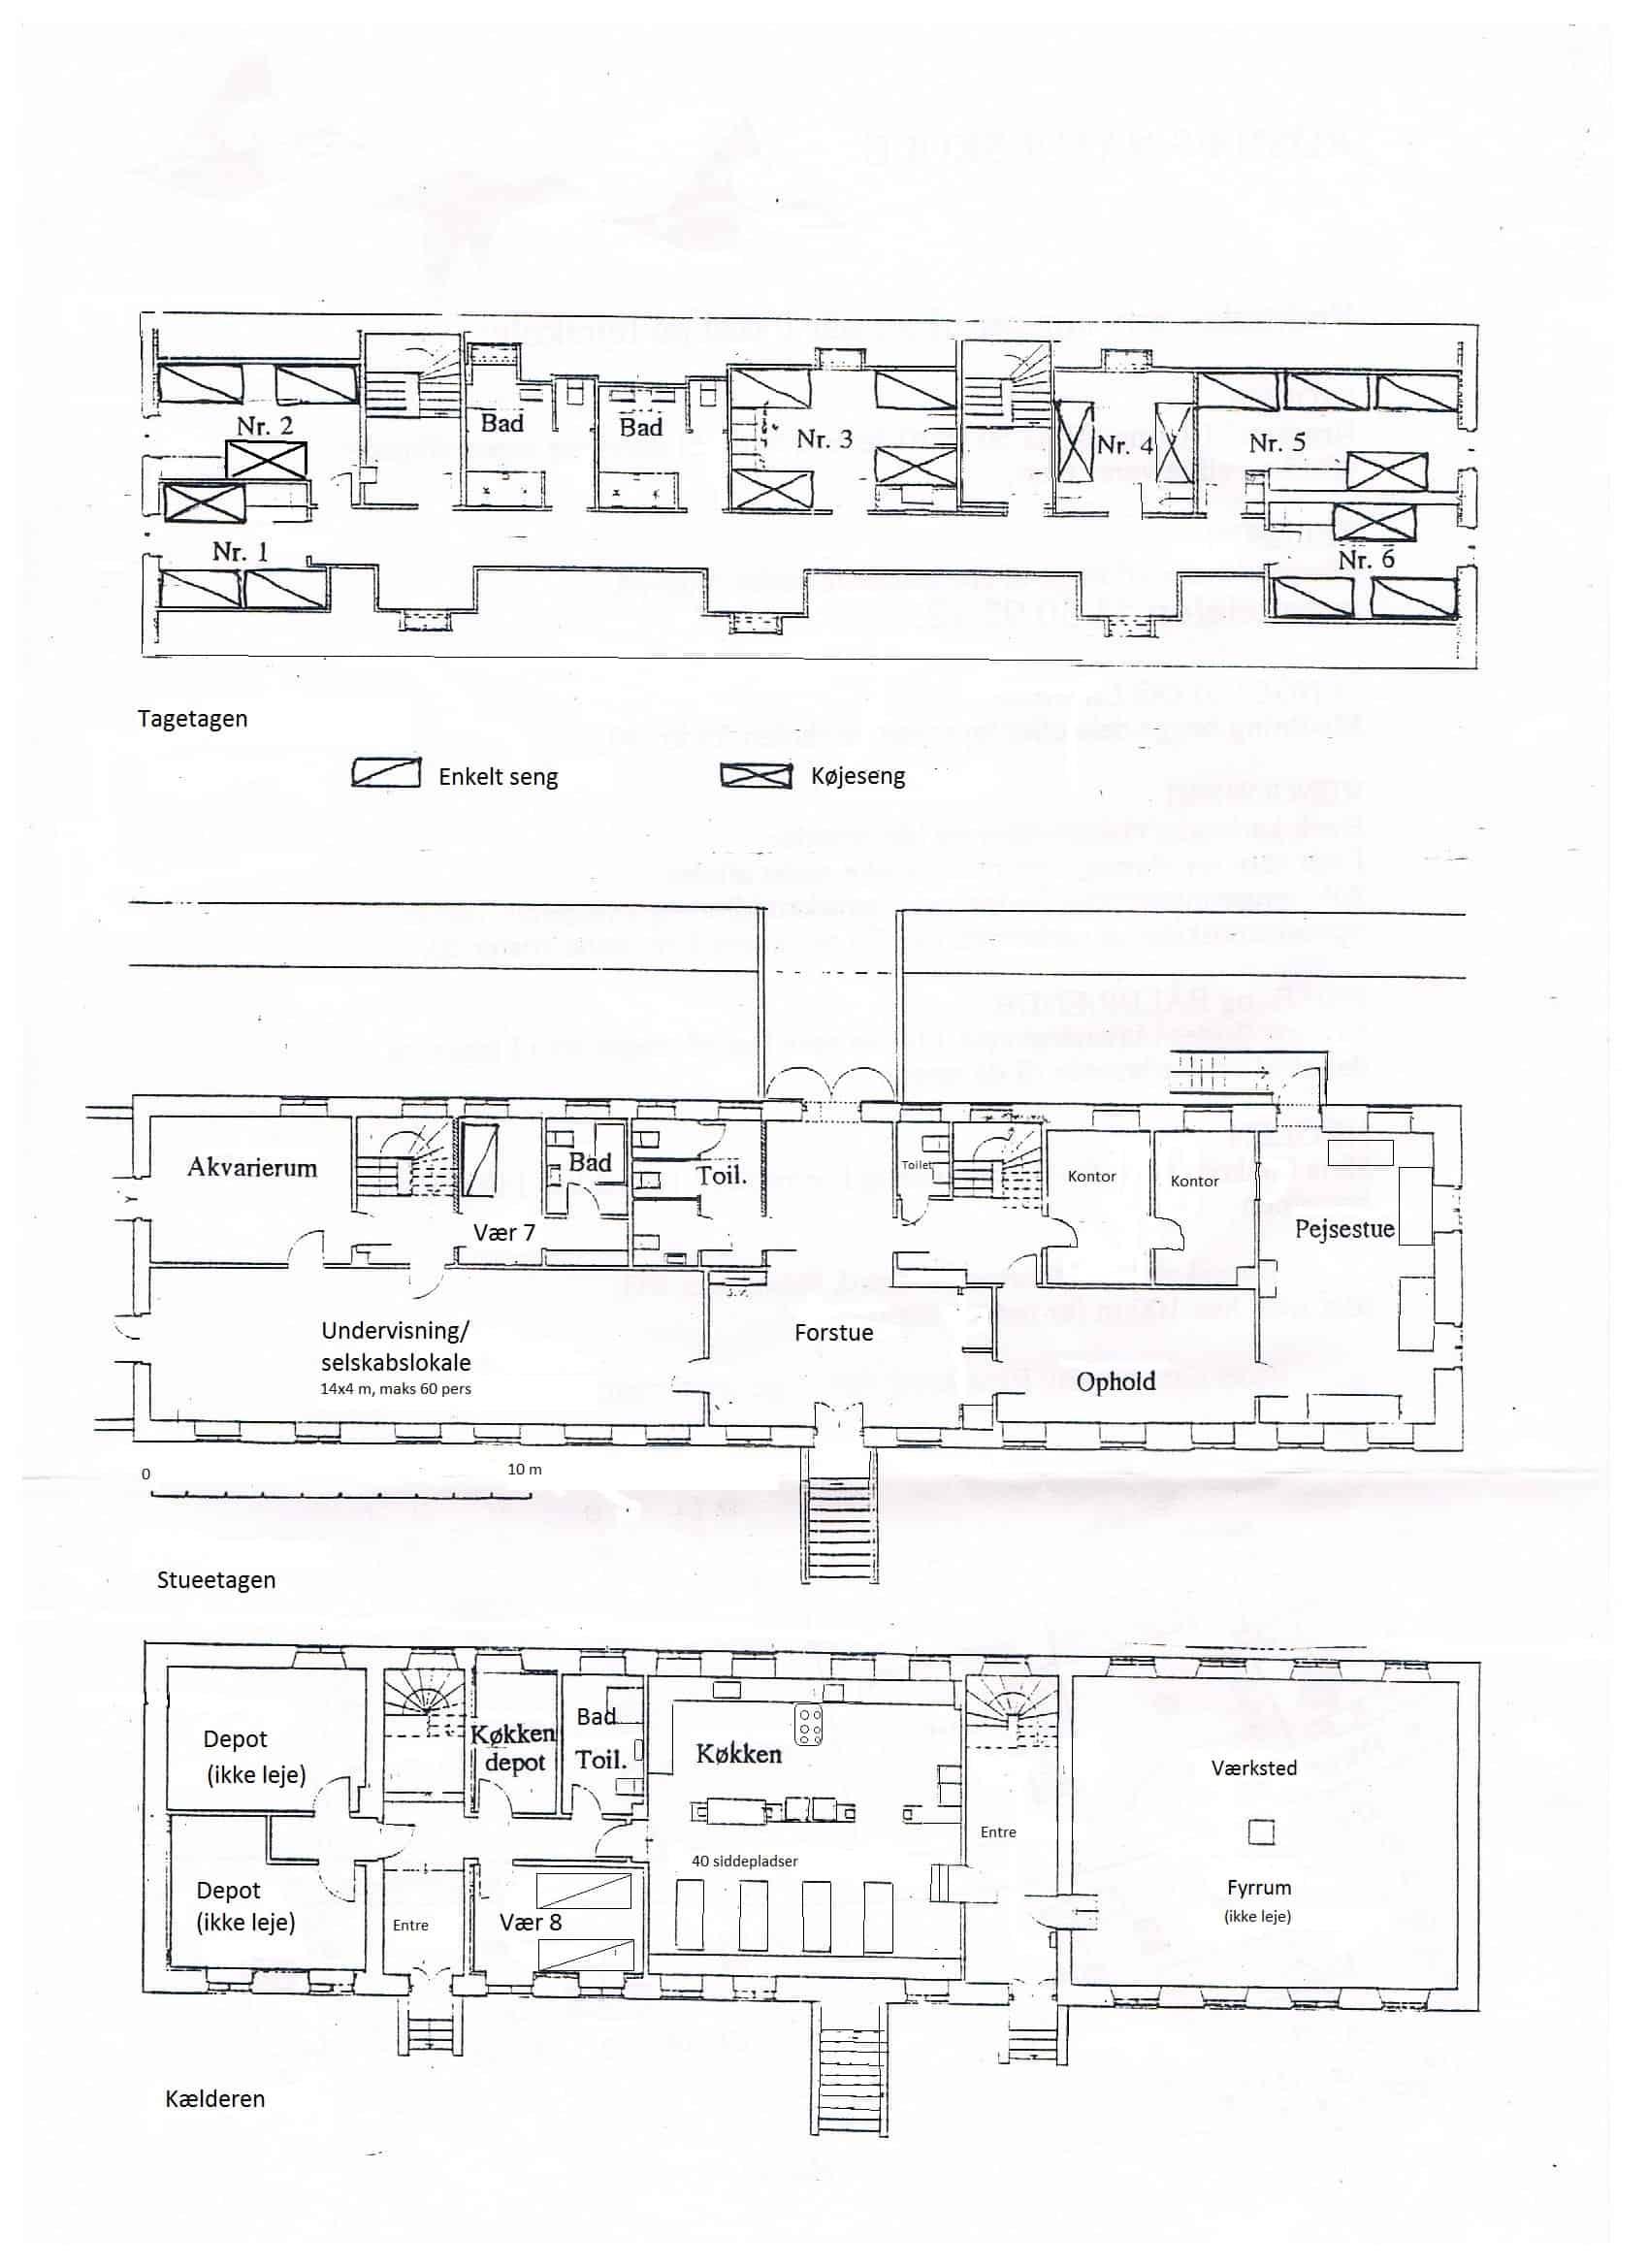 Grundplan over Røsnæs Naturskole